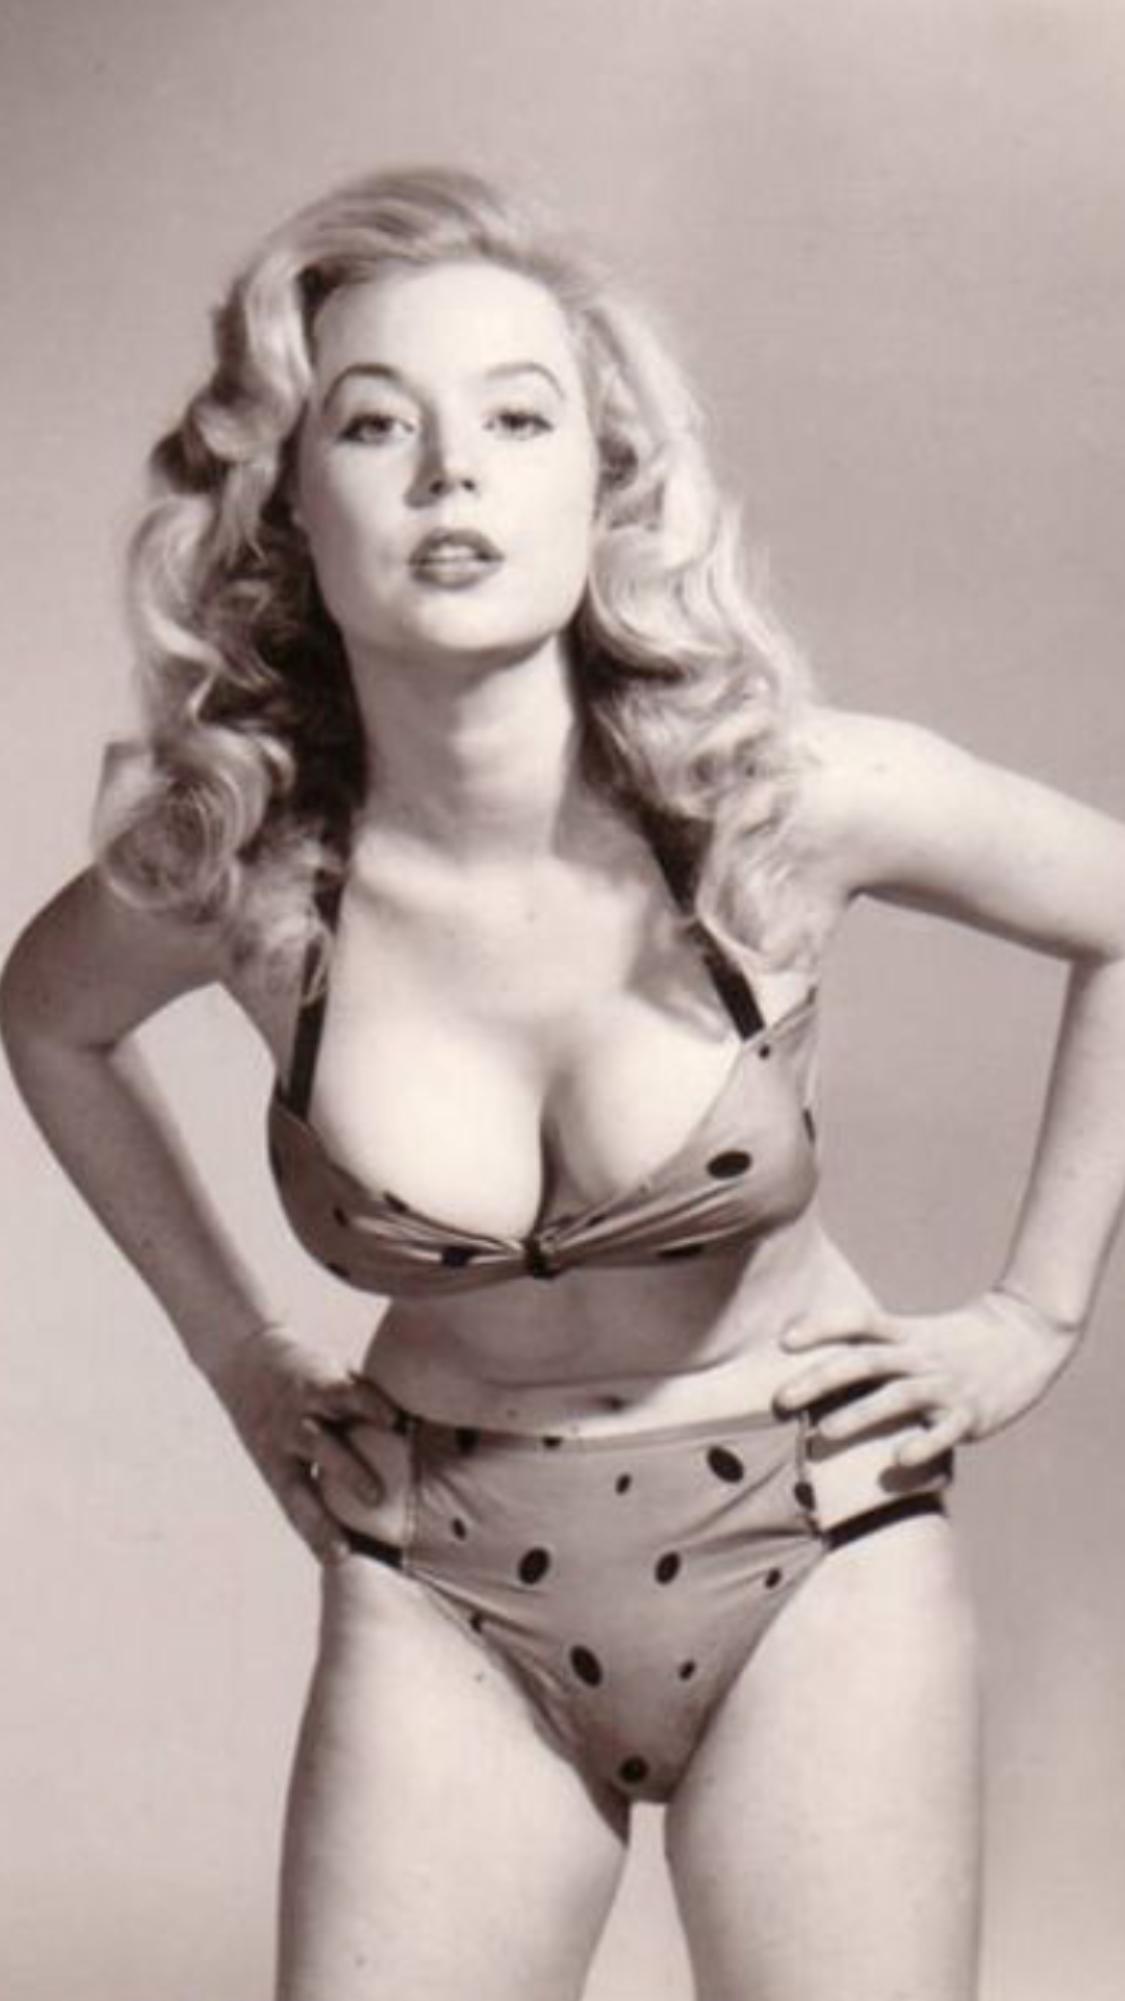 Bikini Betty White nudes (59 photos), Sexy, Bikini, Feet, cleavage 2017